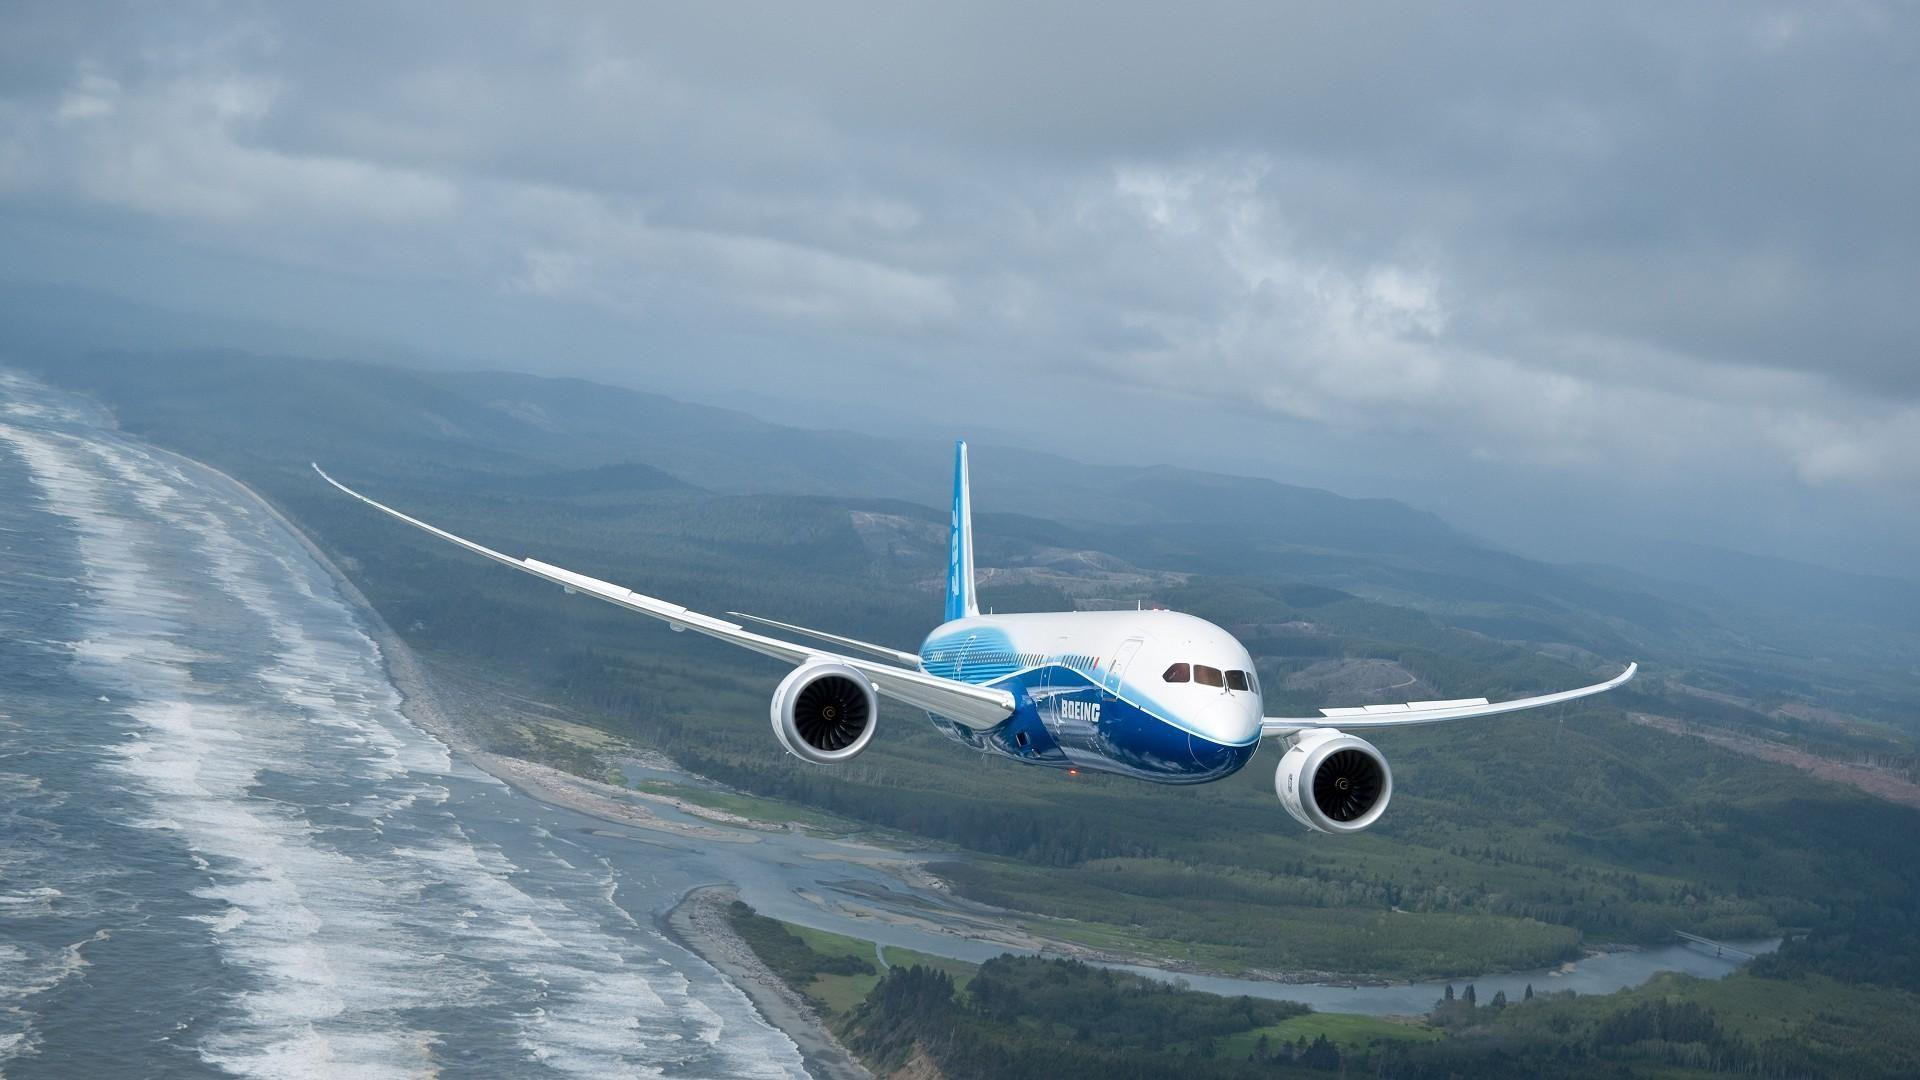 Boeing 787 Dreamliner Wallpapers Hd Wallpaper Cave